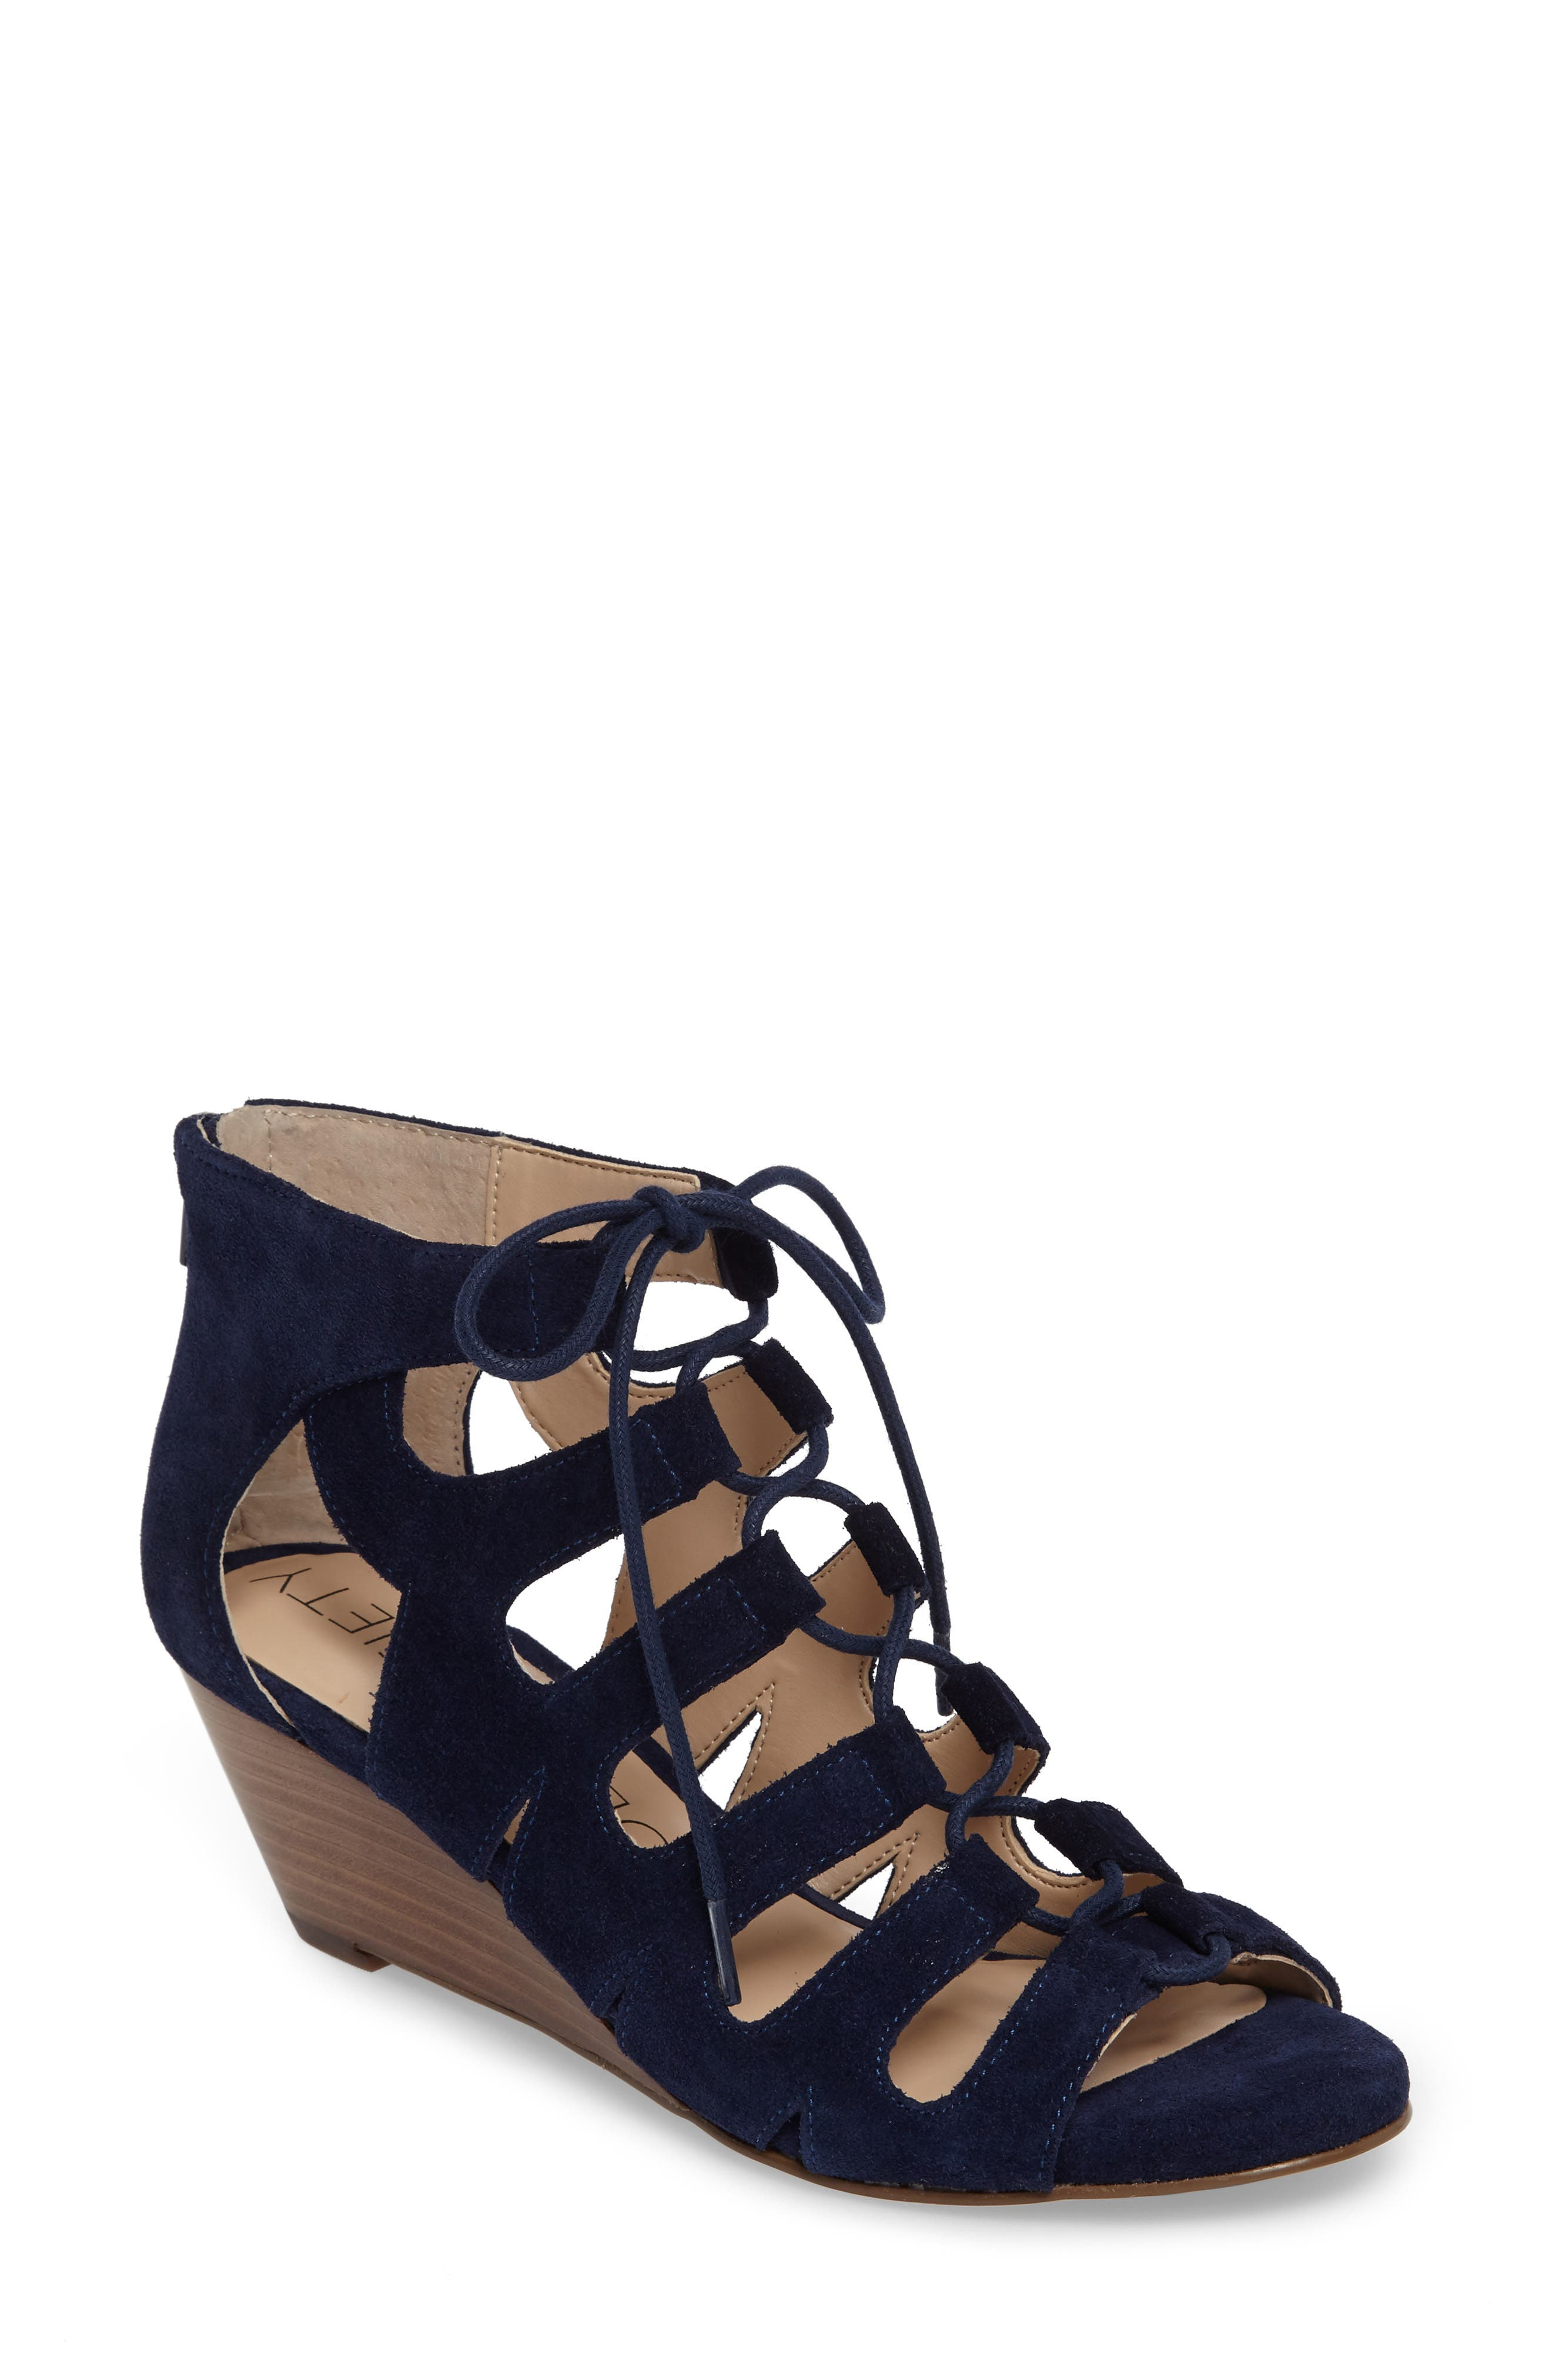 'Freyaa' Wedge Sandal,                         Main,                         color, Navy Suede